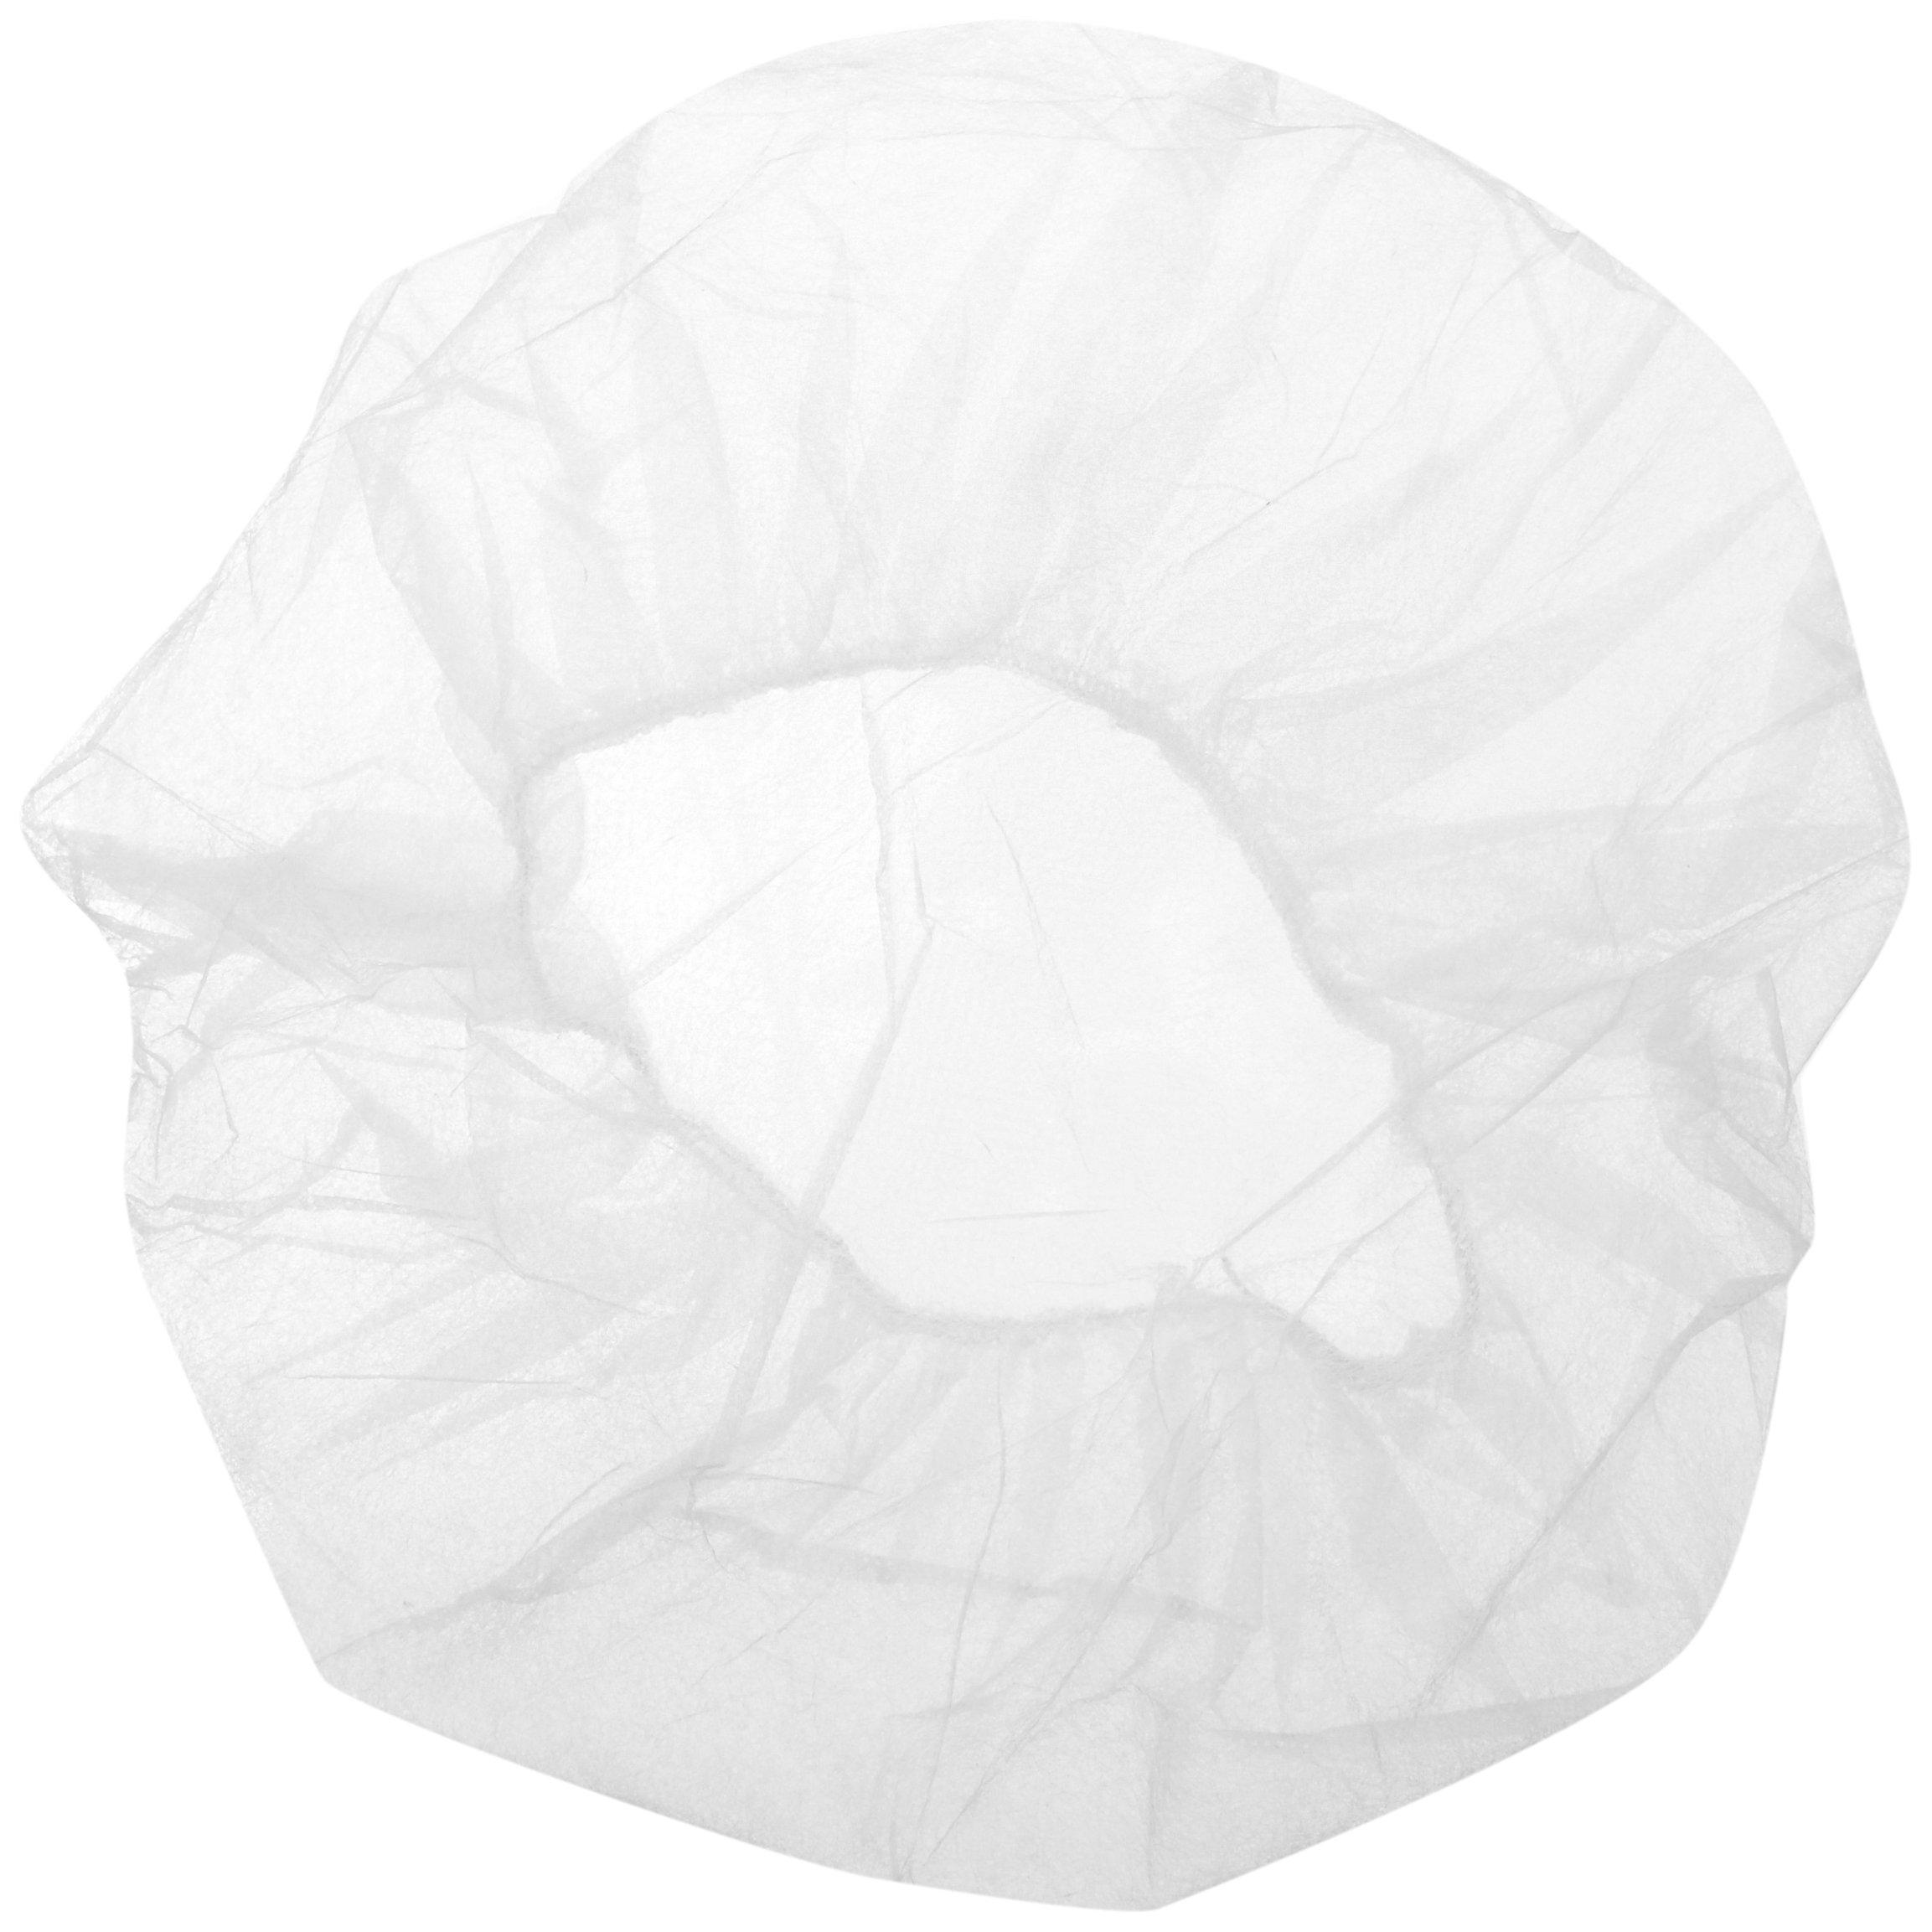 Keystone 110NWI-10-21-WBG White Lightweight Polypropylene Bouffant Cap, 21'' Size (Case of 1000) by Keystone